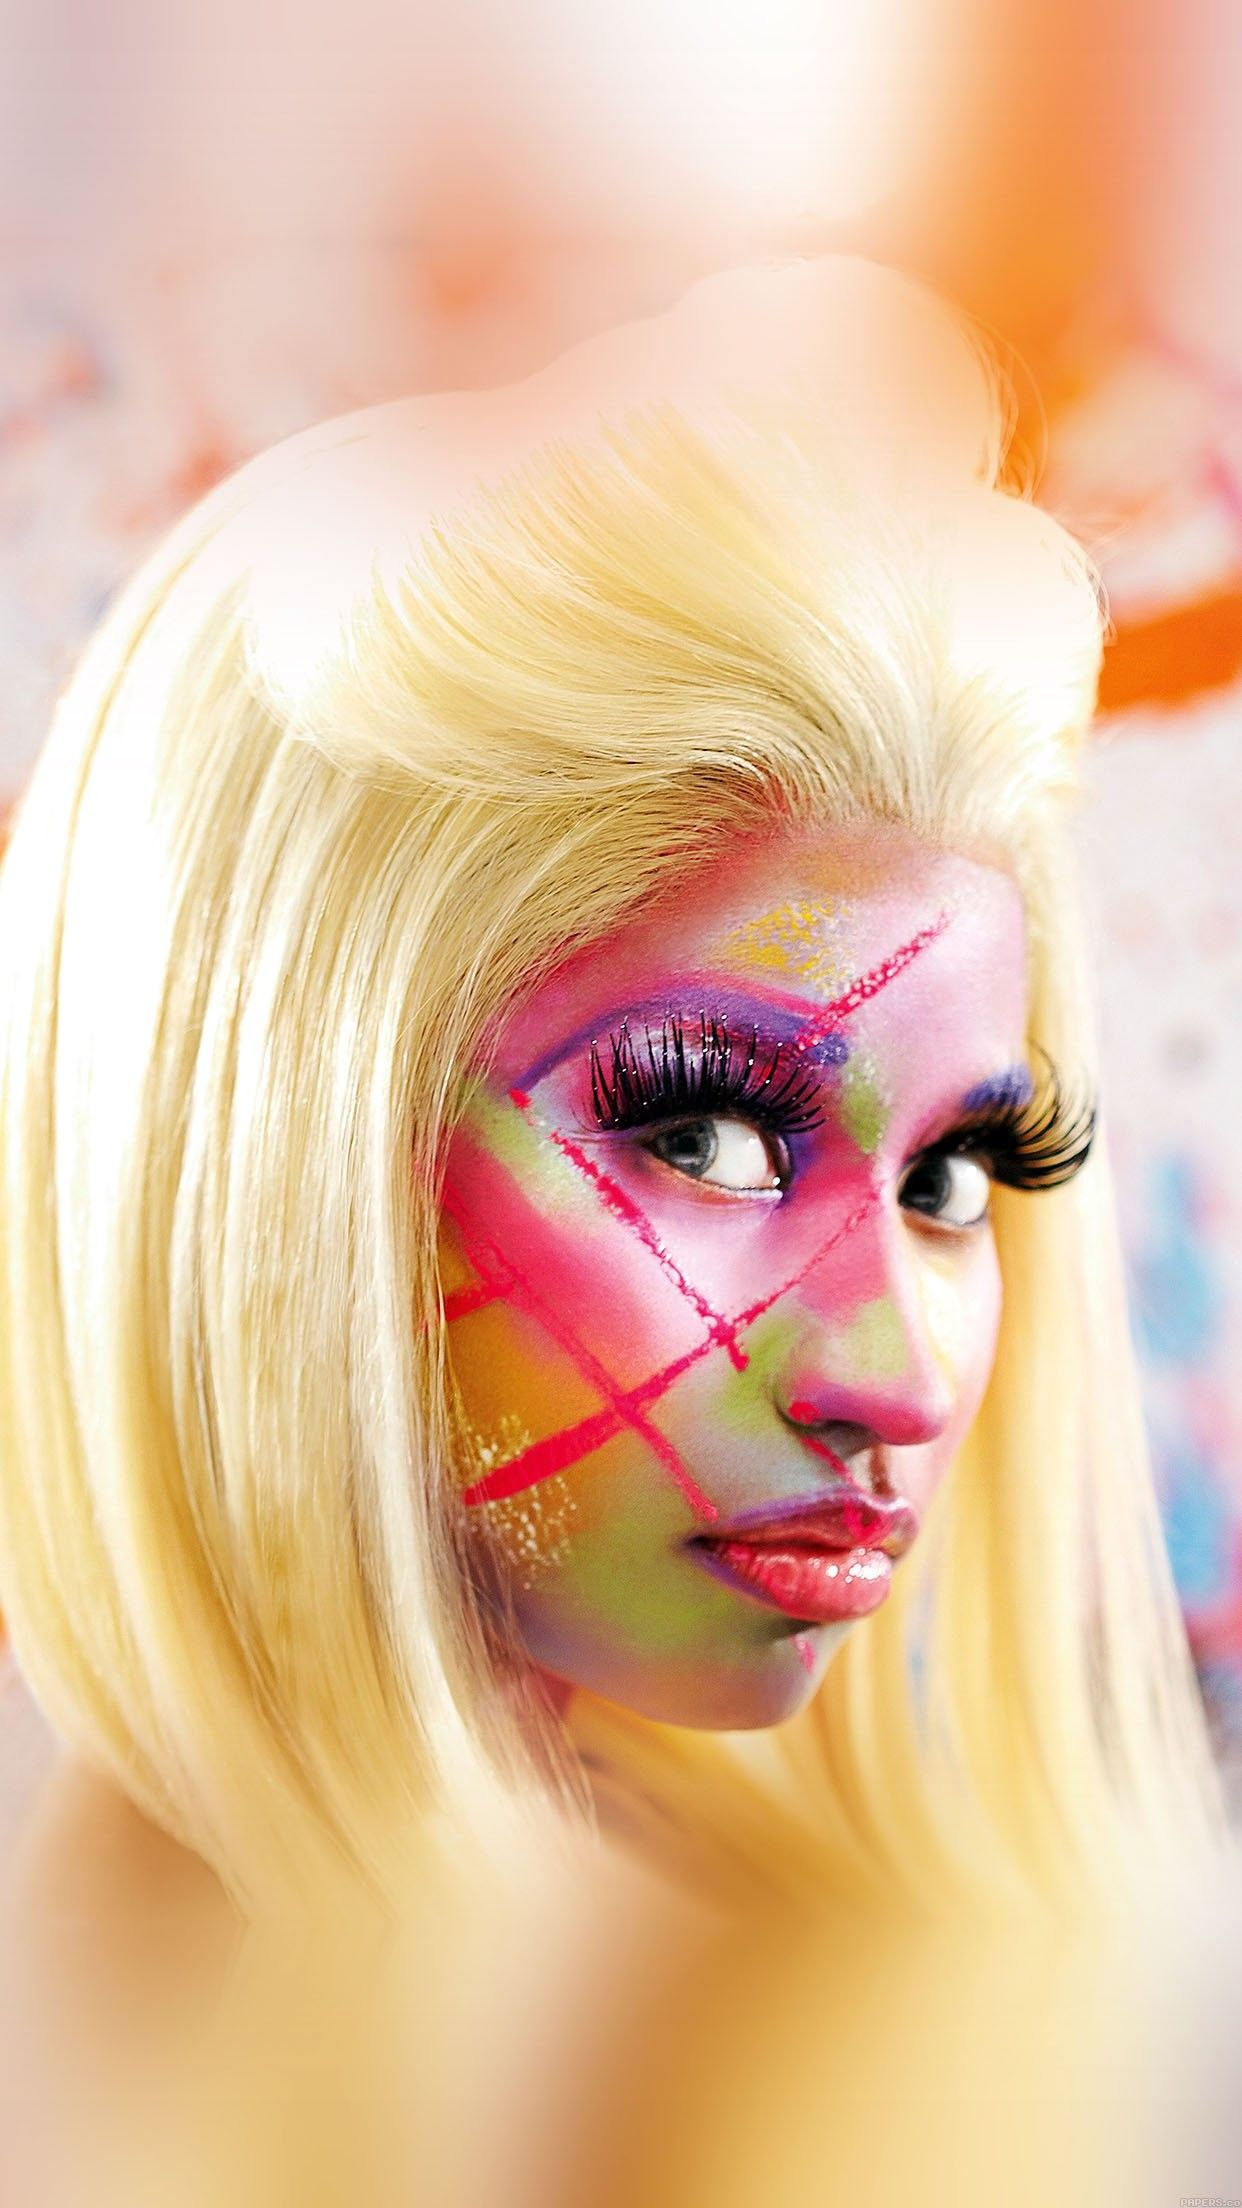 64+ Nikki Minaj Wallpapers on WallpaperPlay (With images